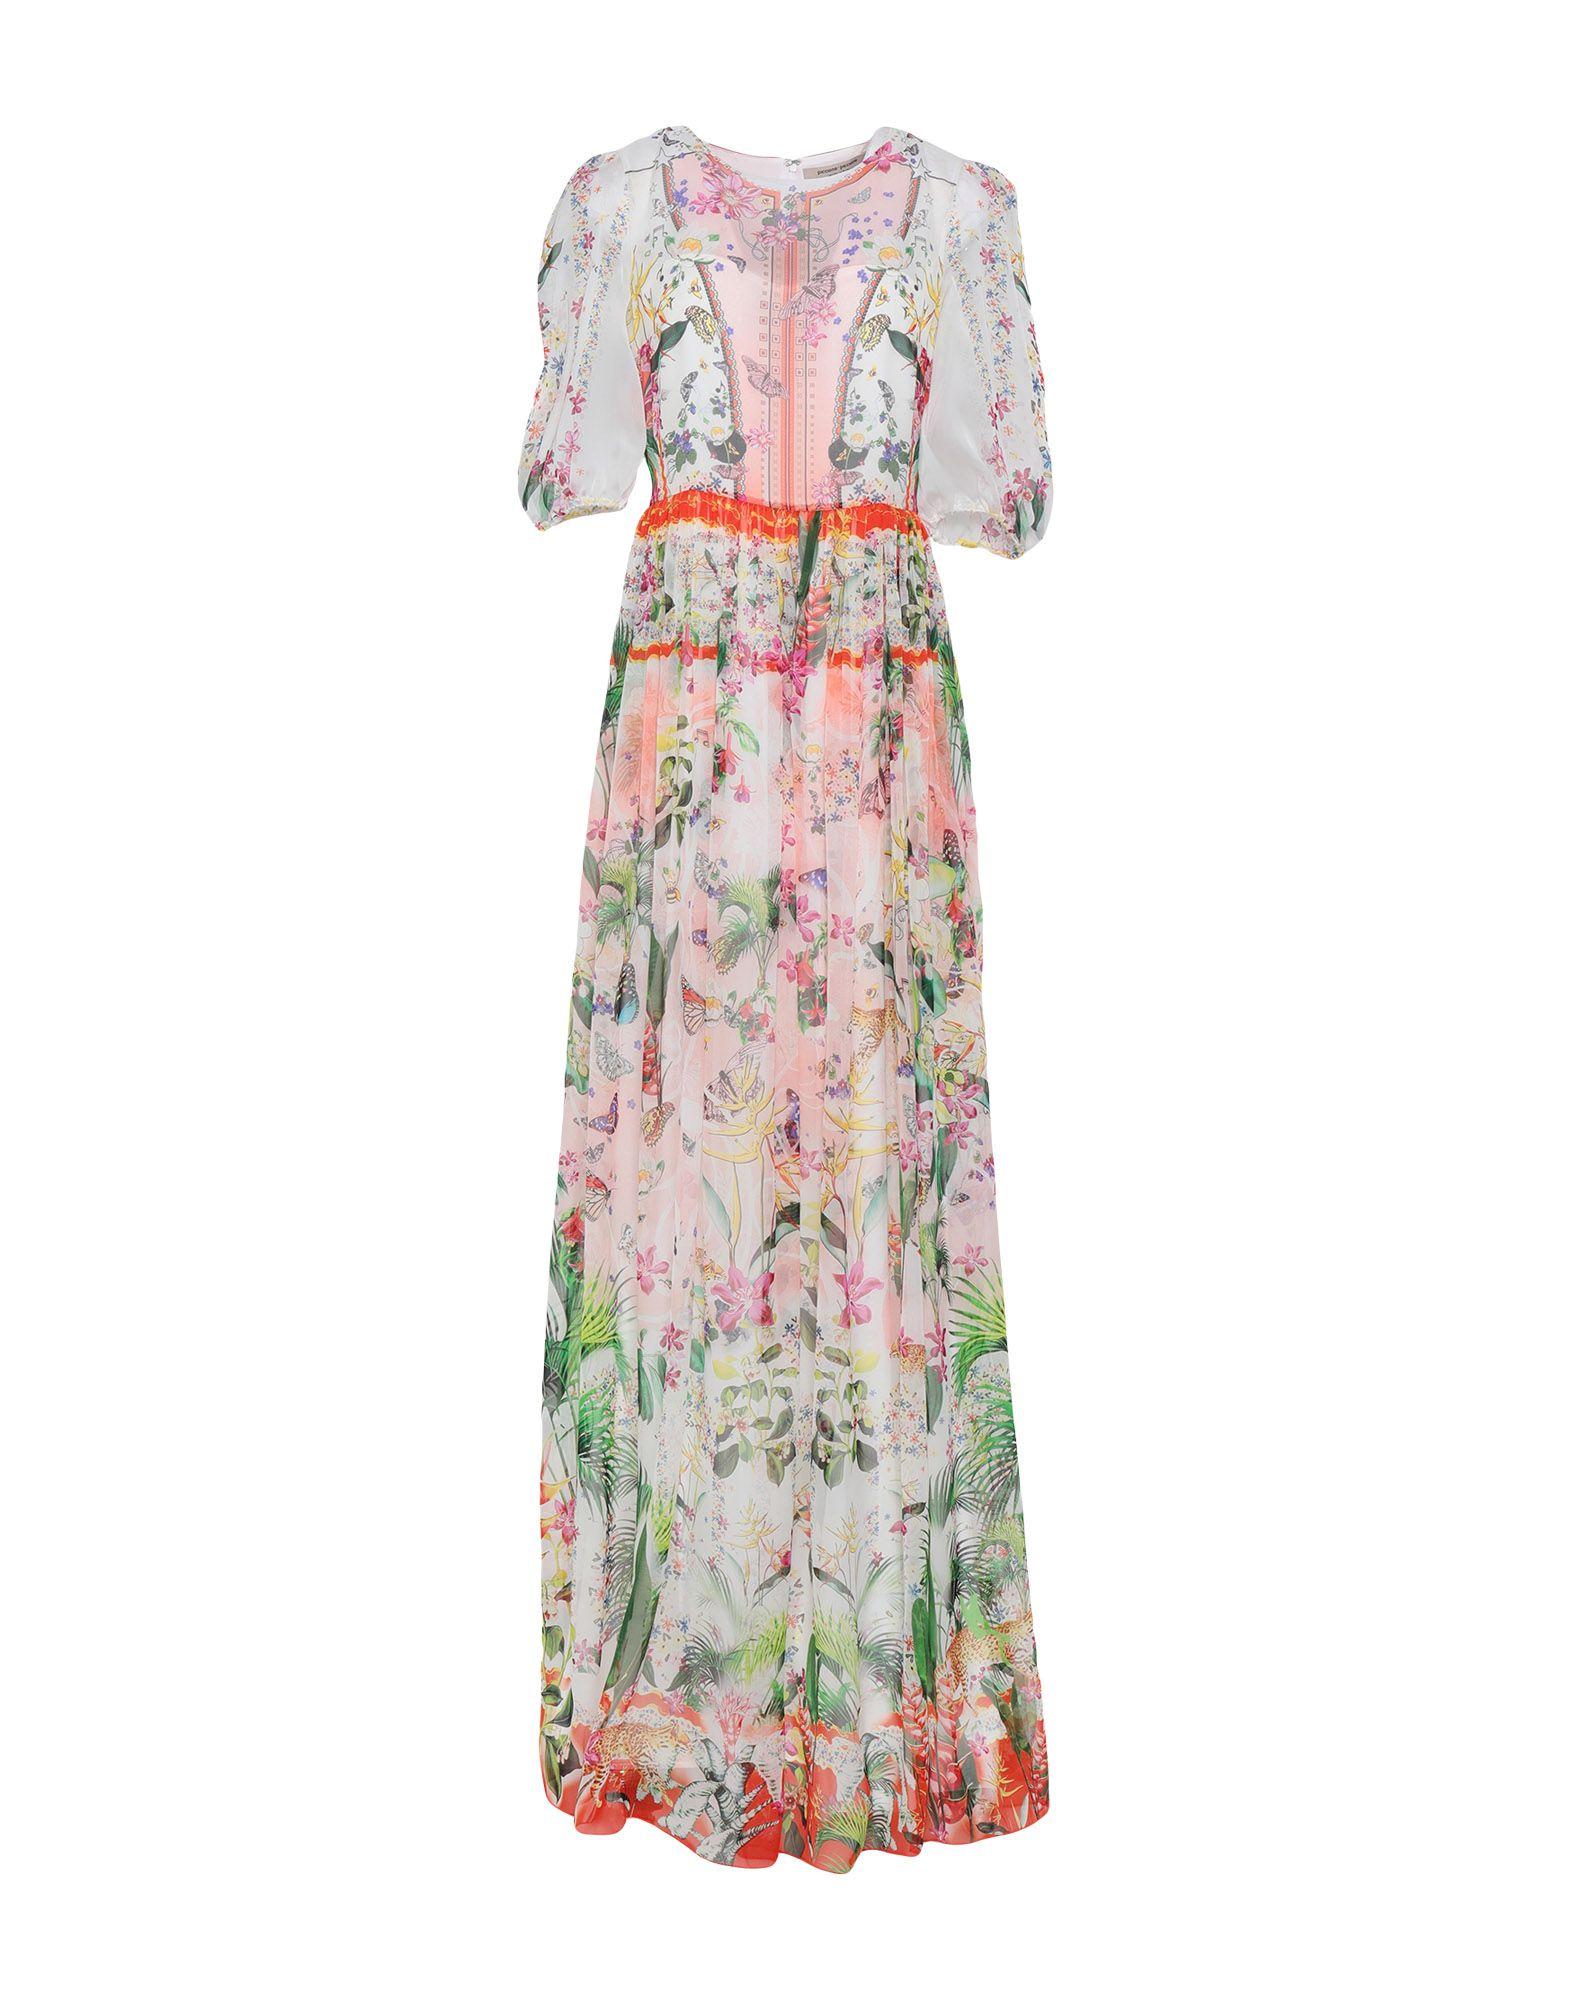 PICCIONE.PICCIONE Длинное платье oz10 длинное платье